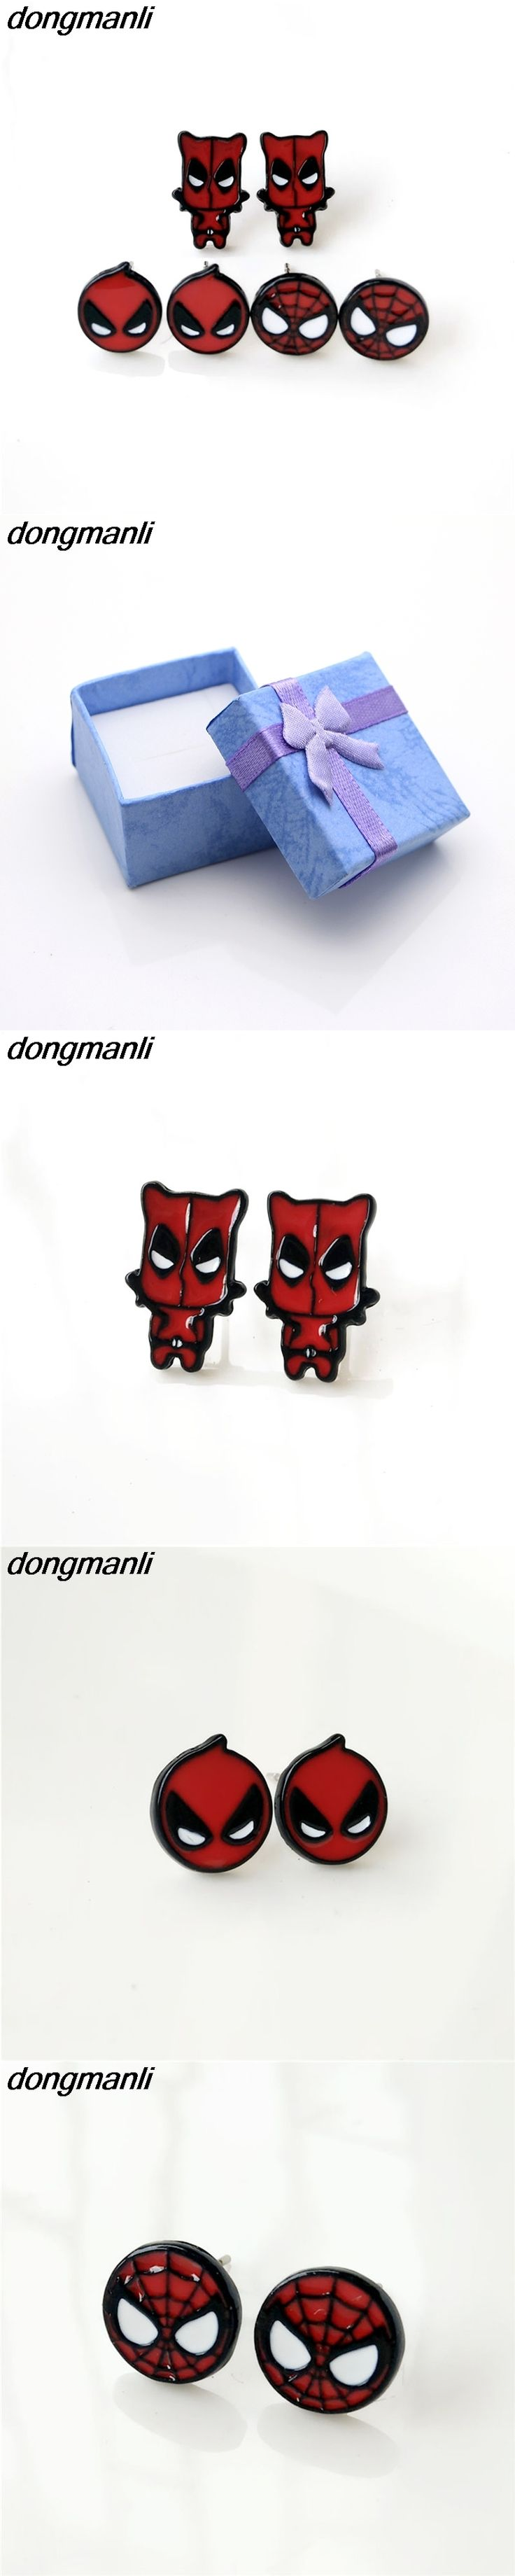 P346 dongmanli Hot Sale Classic Cartoon Anime Cute  Deadpool Spider-Man Homecoming Stud earrings for women Girl Children Gift